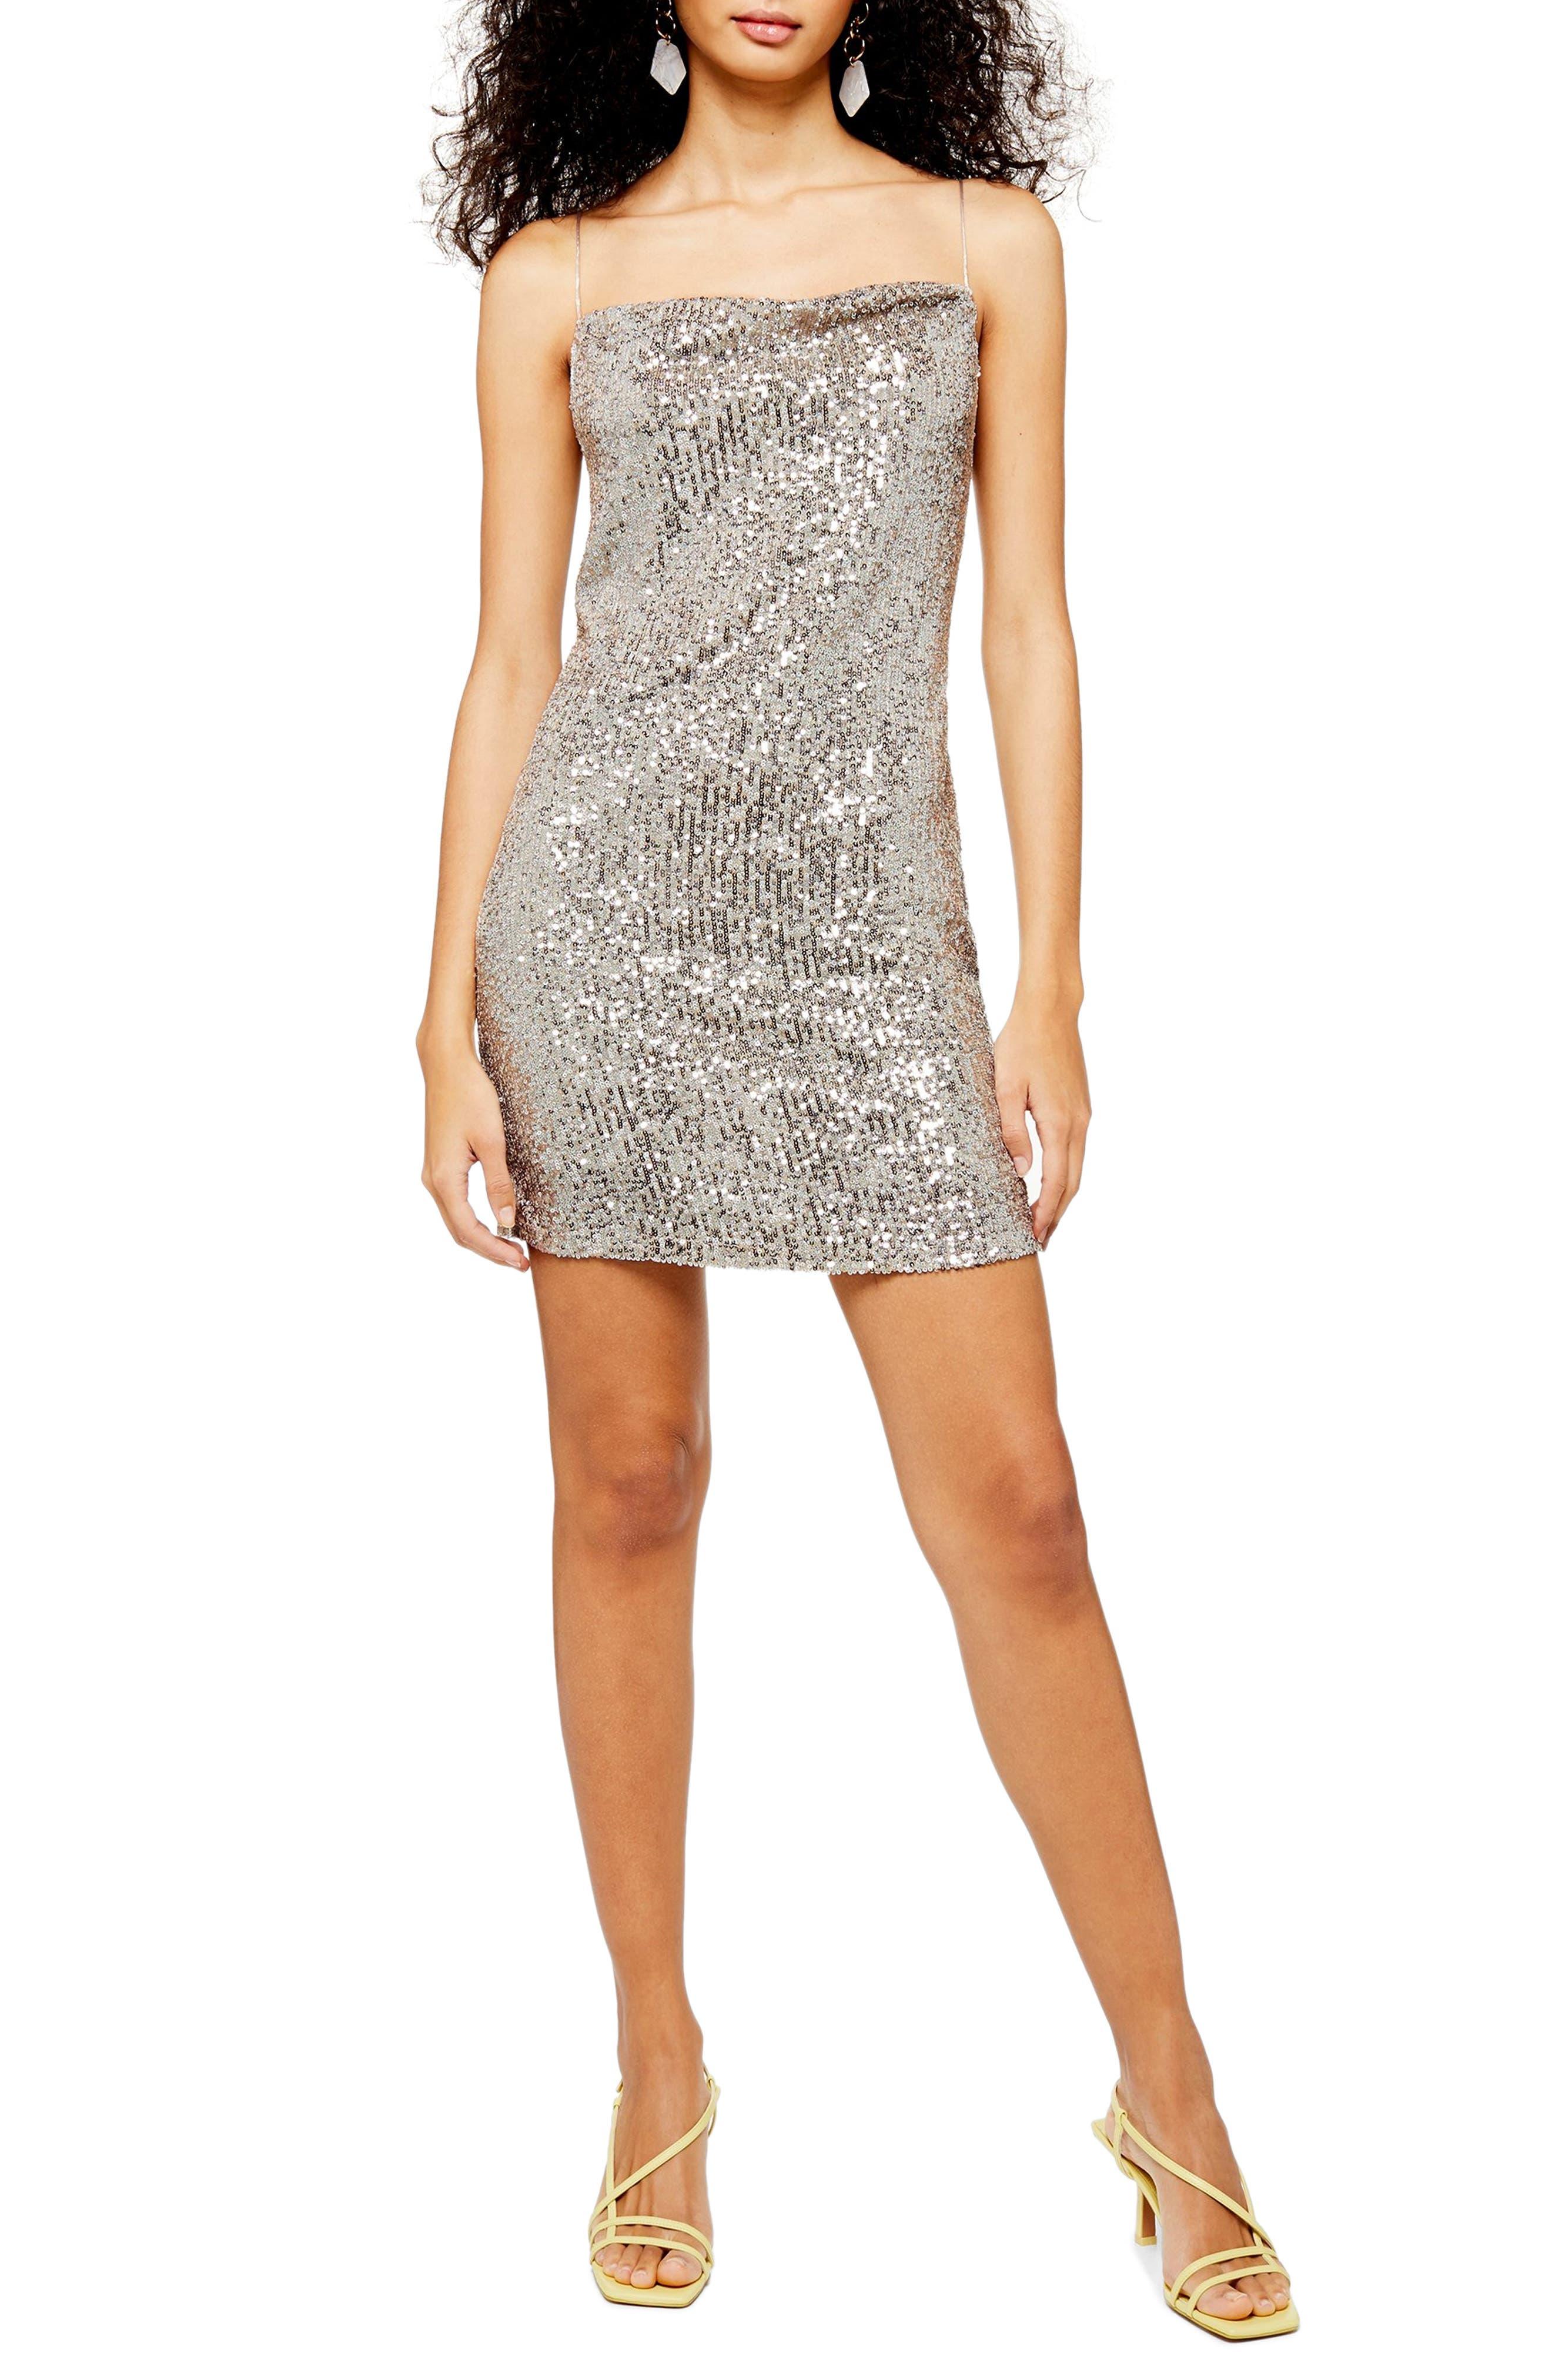 Topshop Sequin Cowl Neck Minidress, US (fits like 14) - Metallic